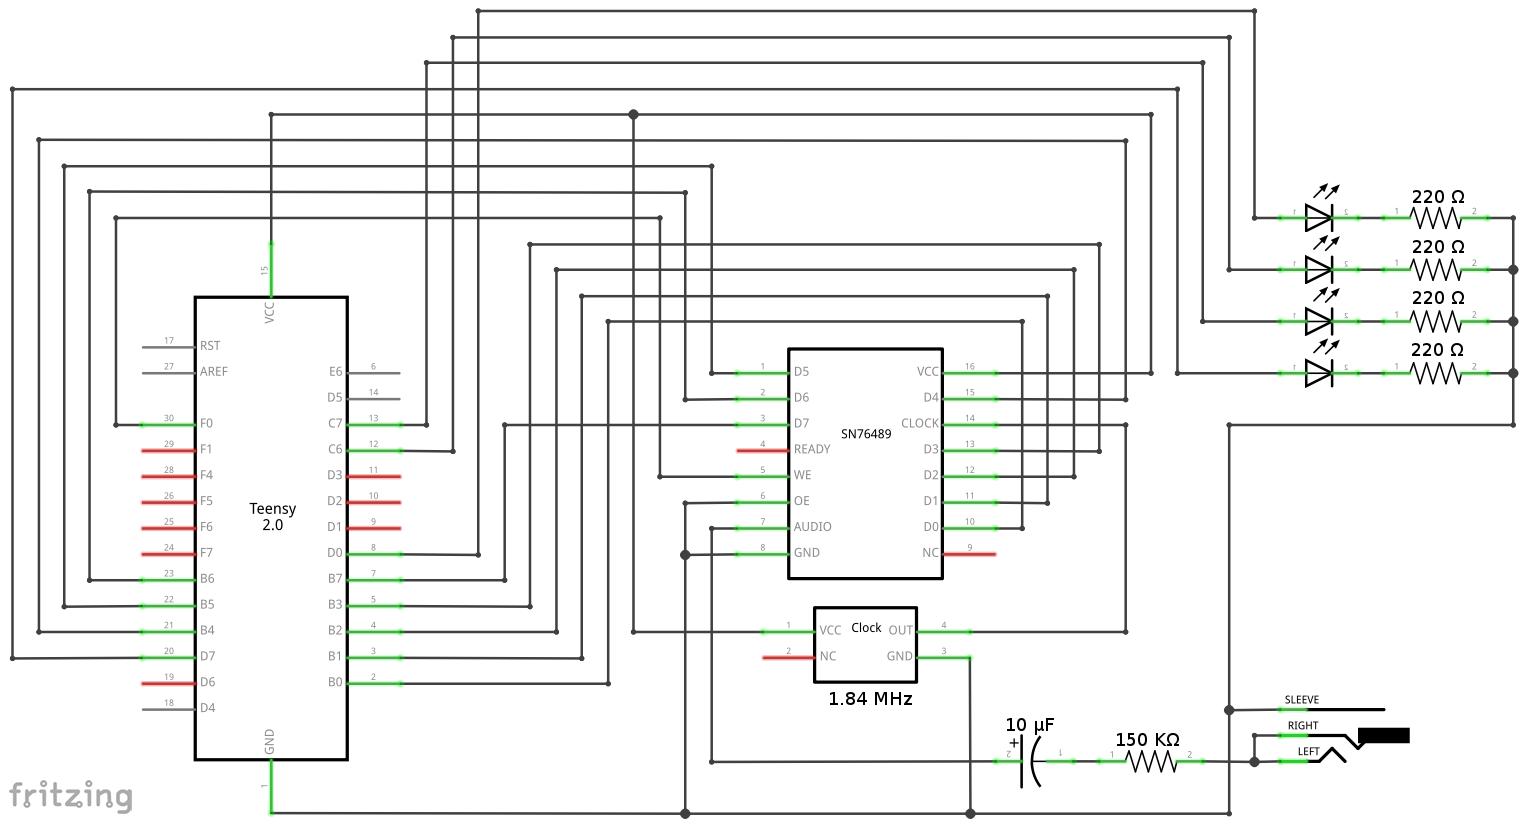 4 Port Usb Hub Wiring Diagram - Technical Diagrams Honda C Pport Wiring Diagram on